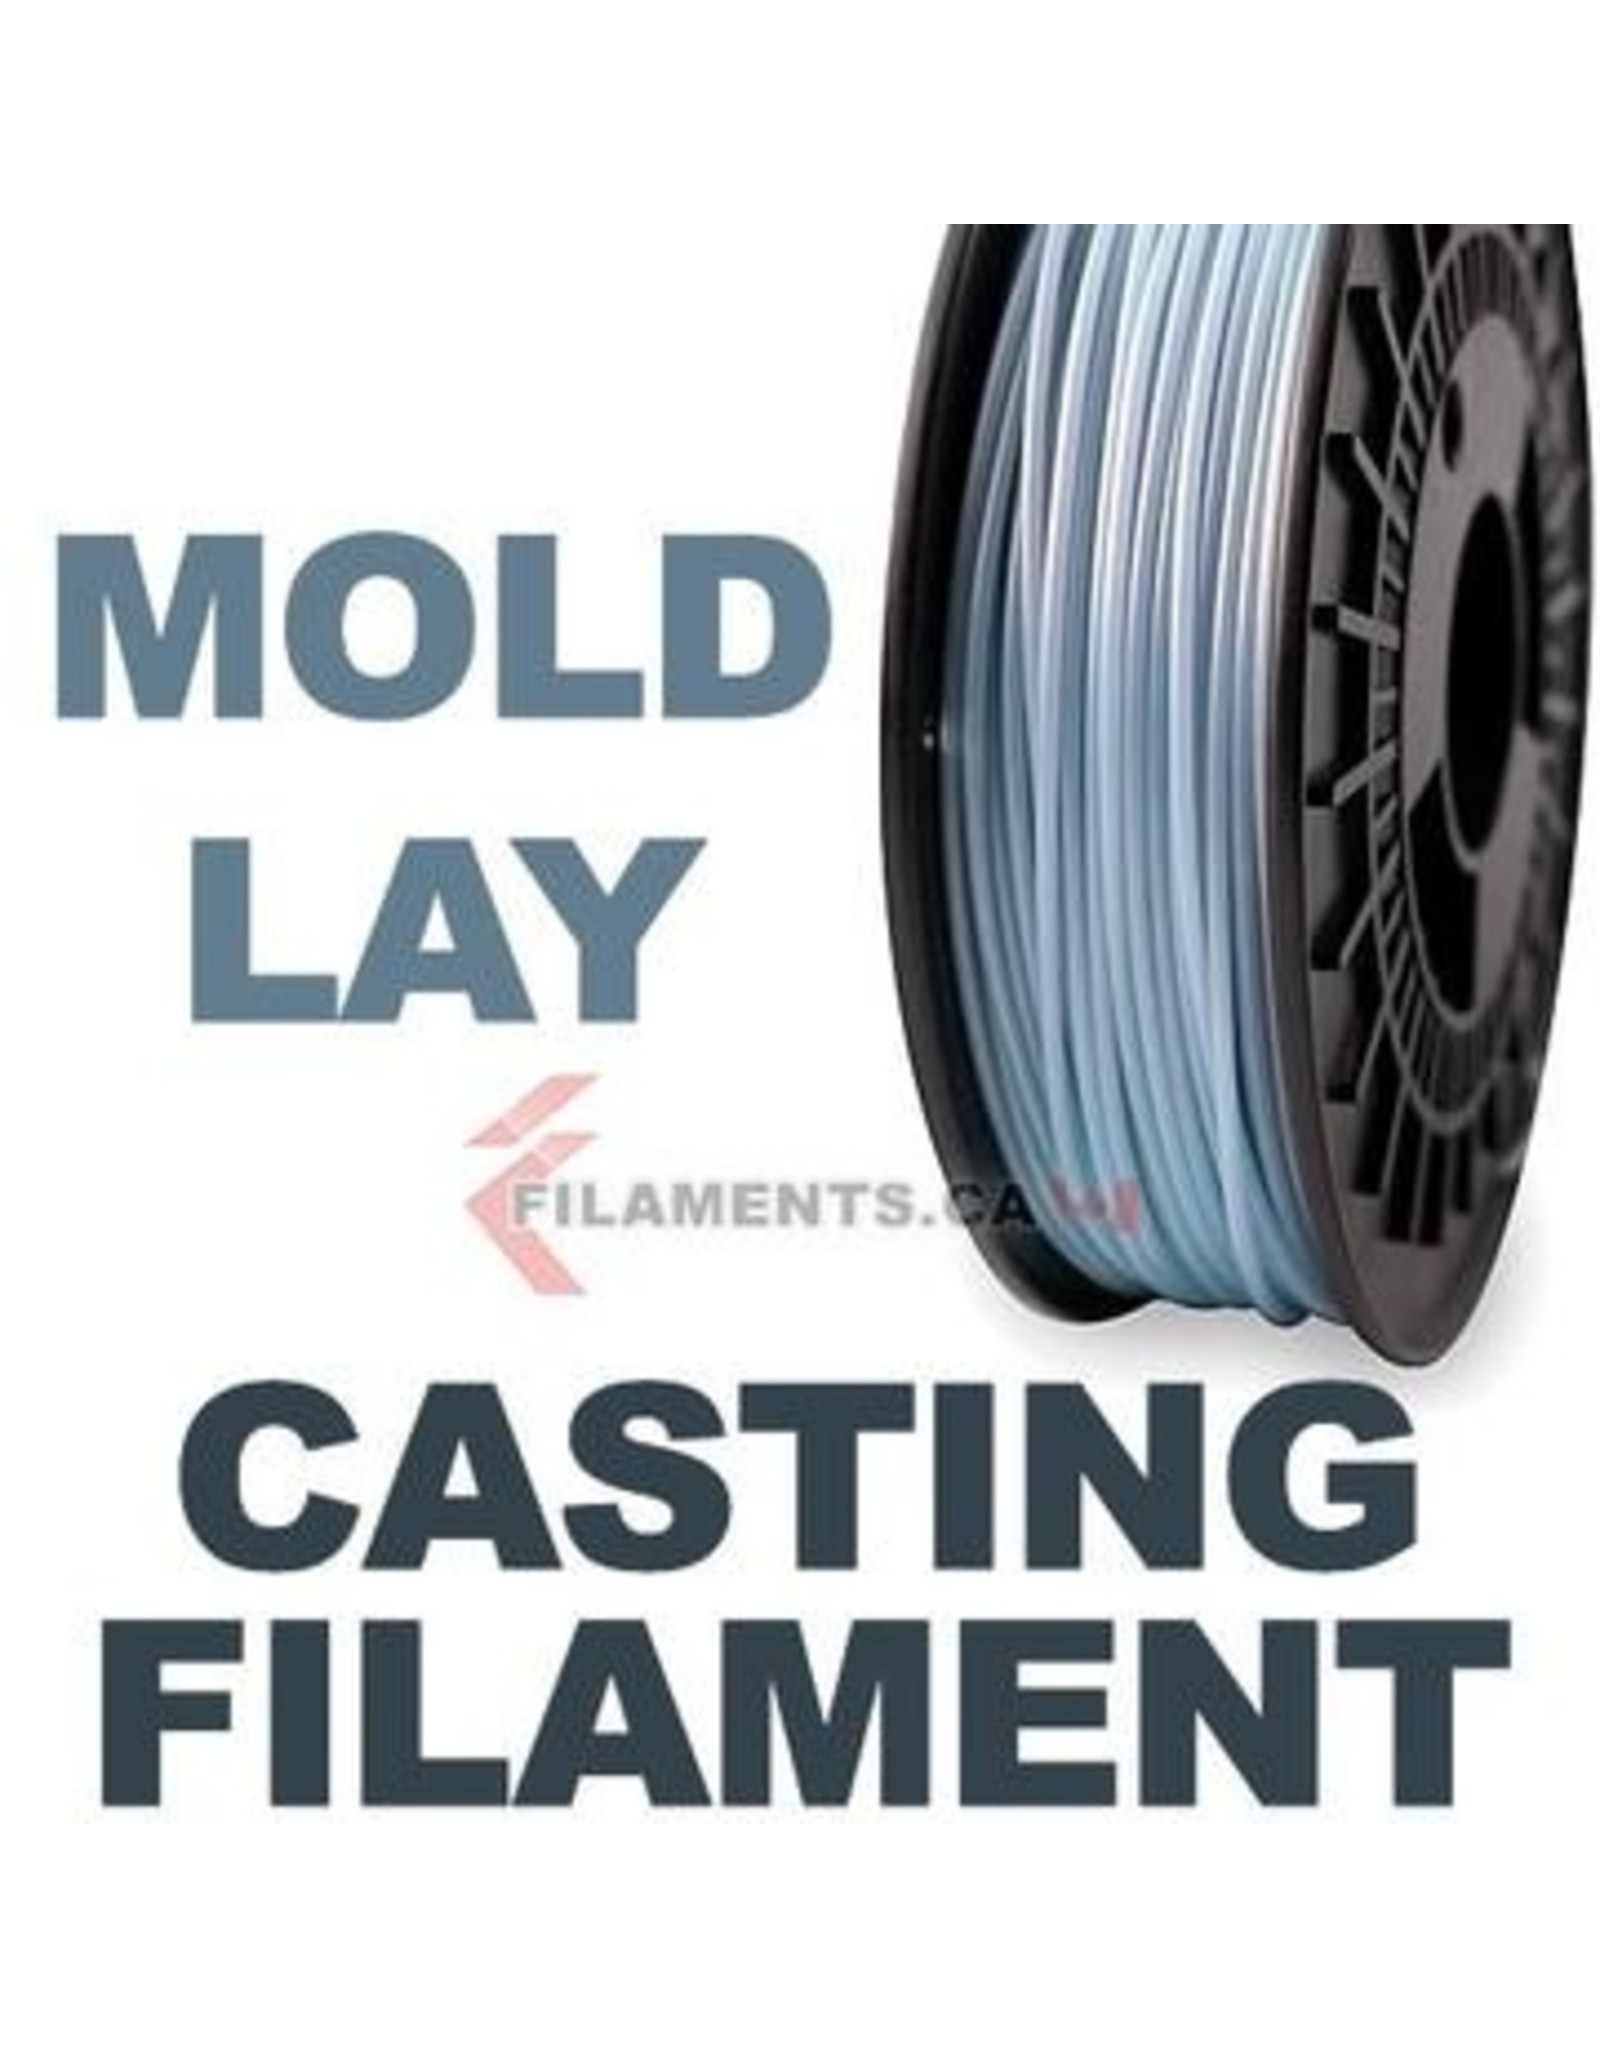 LAY Filaments Moldlay Spool 1.75mm 750 gr